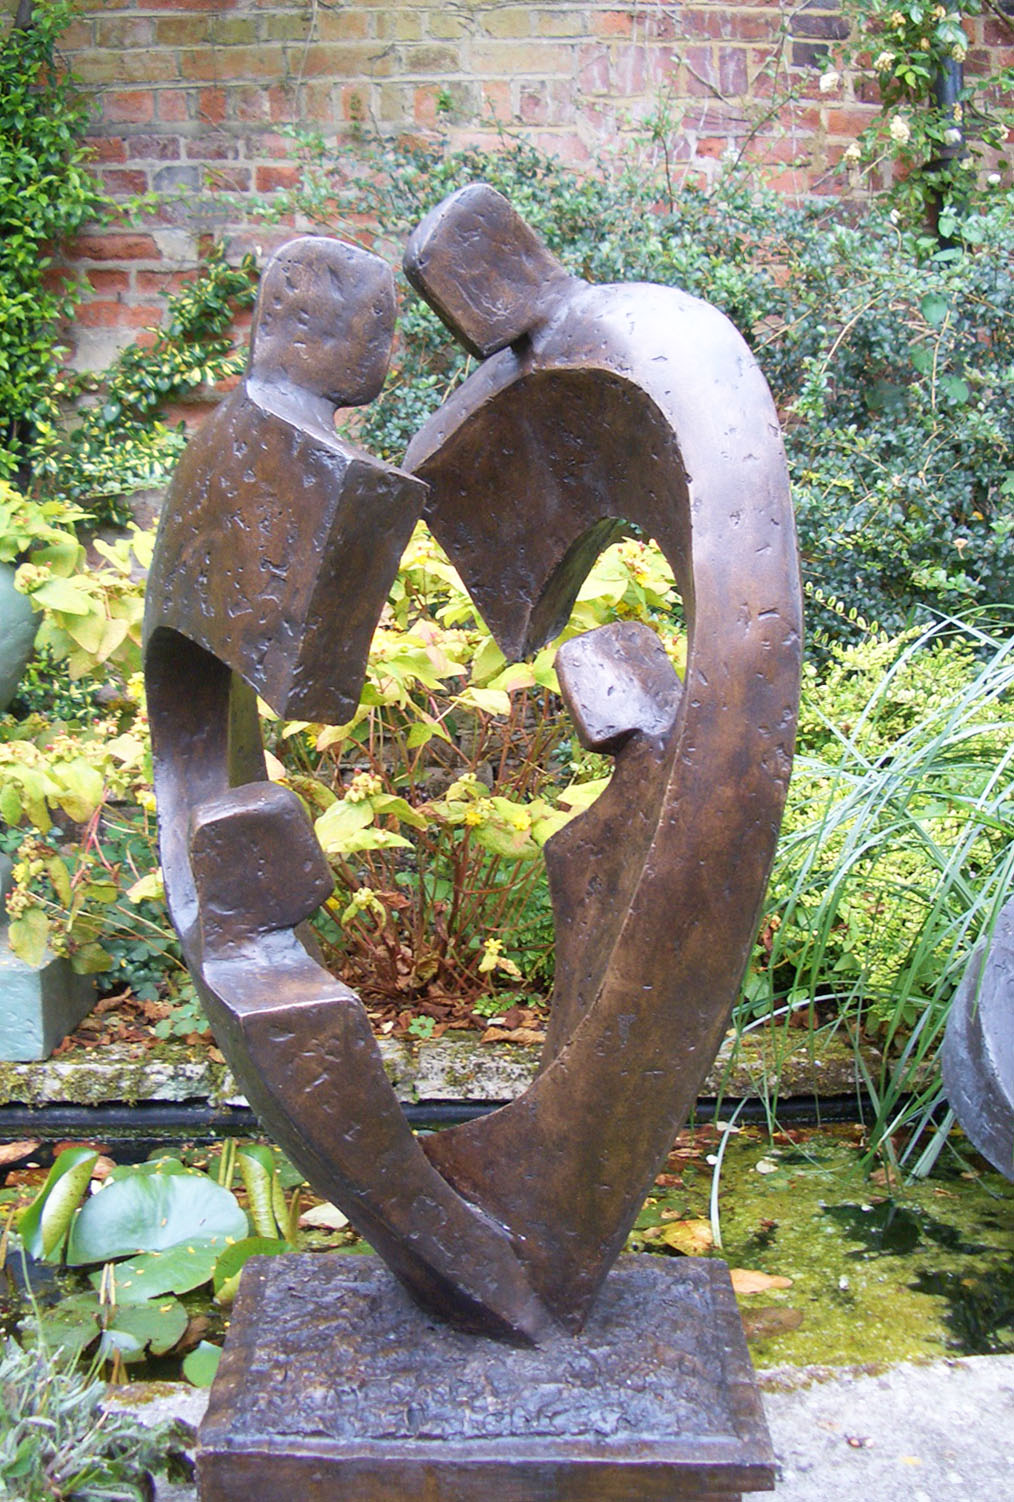 Family Circle Lll Garden Sculpture By Pond John Brown Sculptor